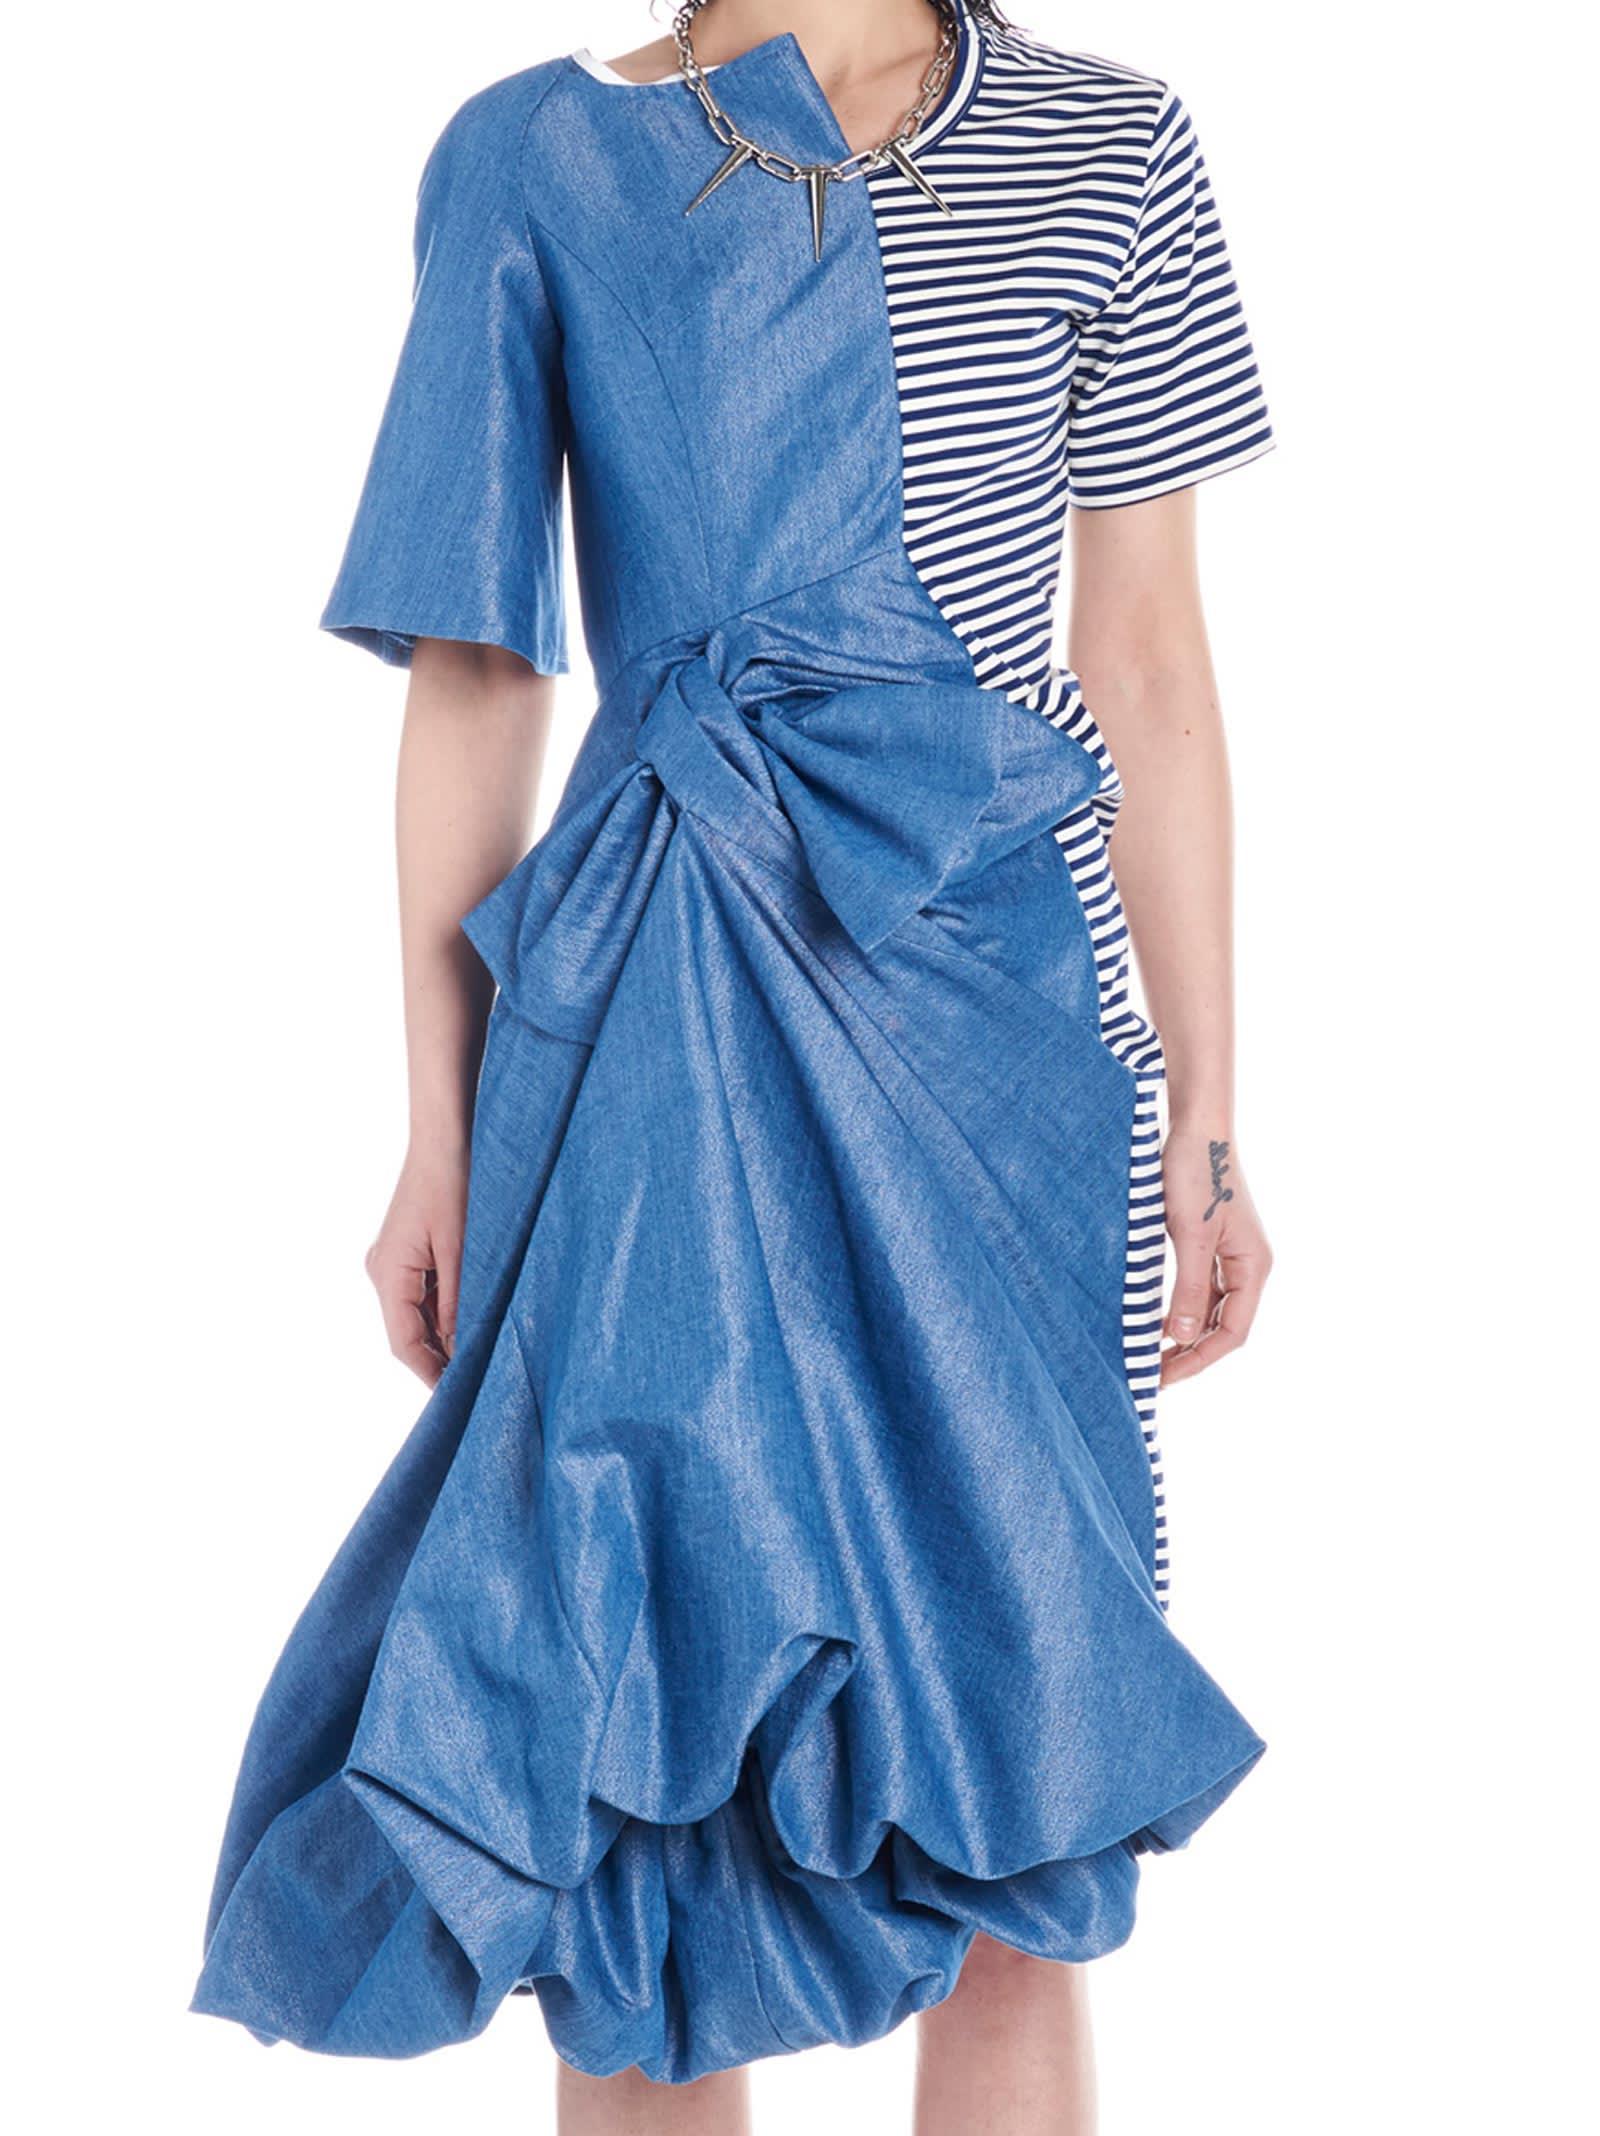 Junya Watanabe Dress